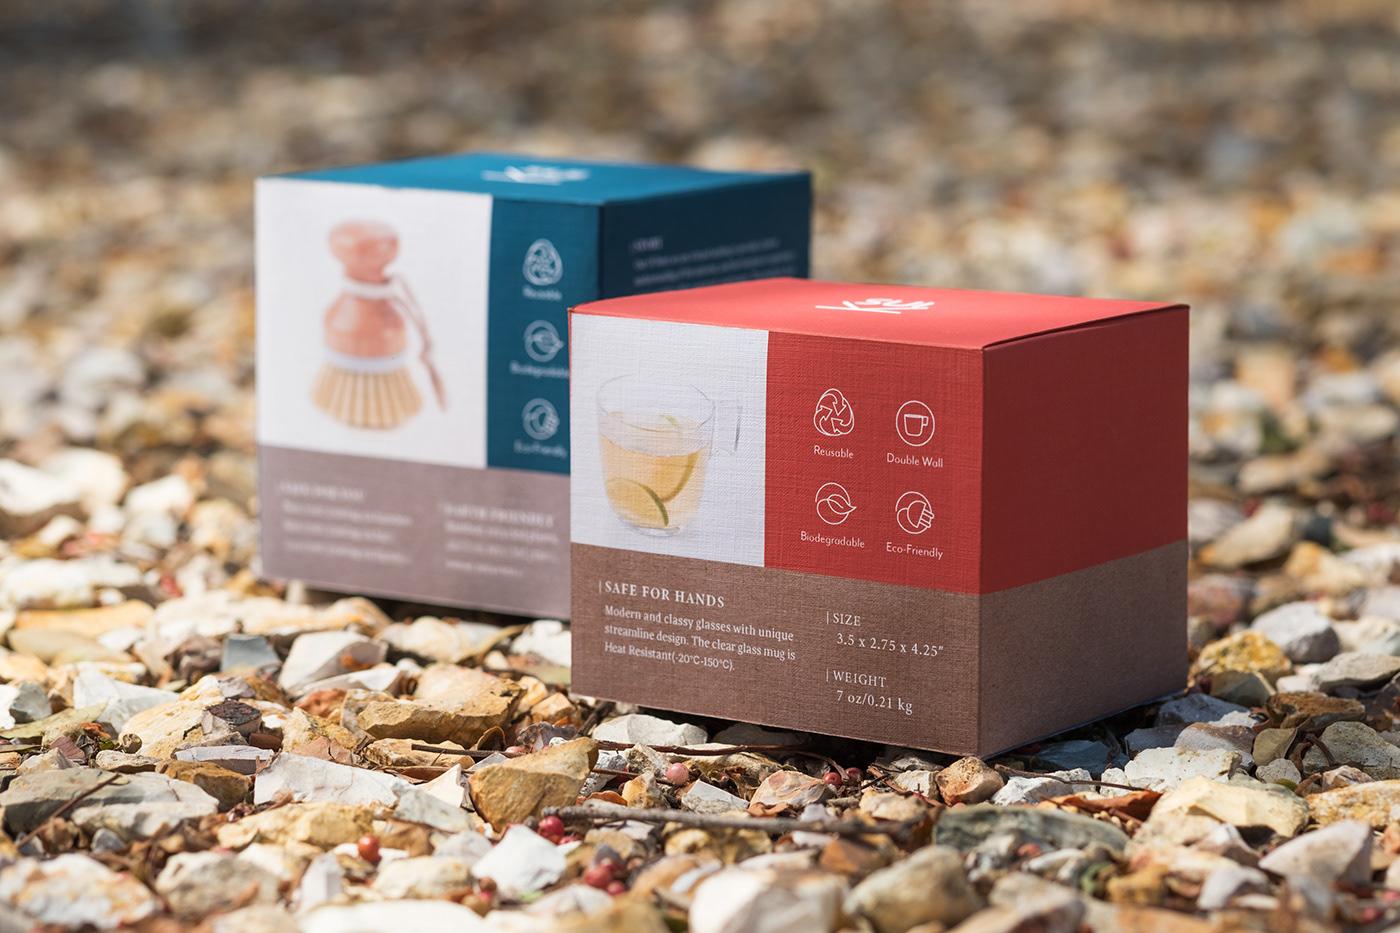 graphicdesign Packaging identity branding  KITCHENWARE KitchenSupply cook design adobeawards